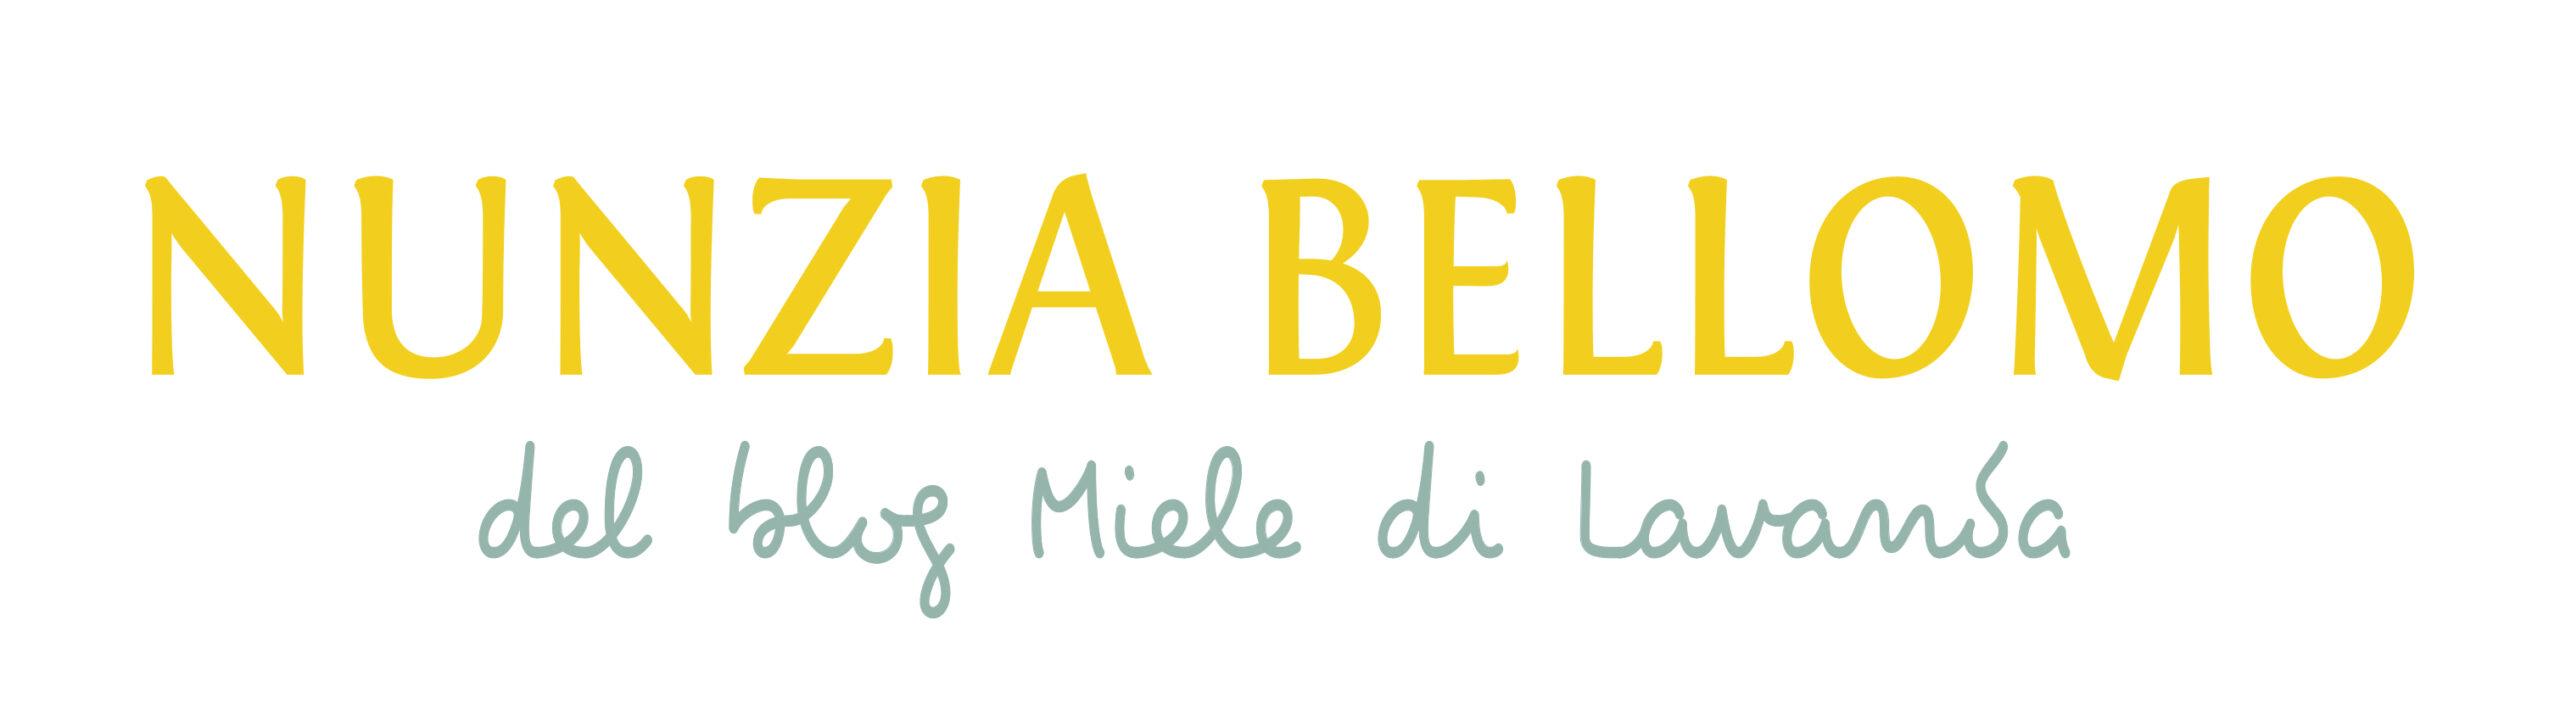 Nunzia Bellomo